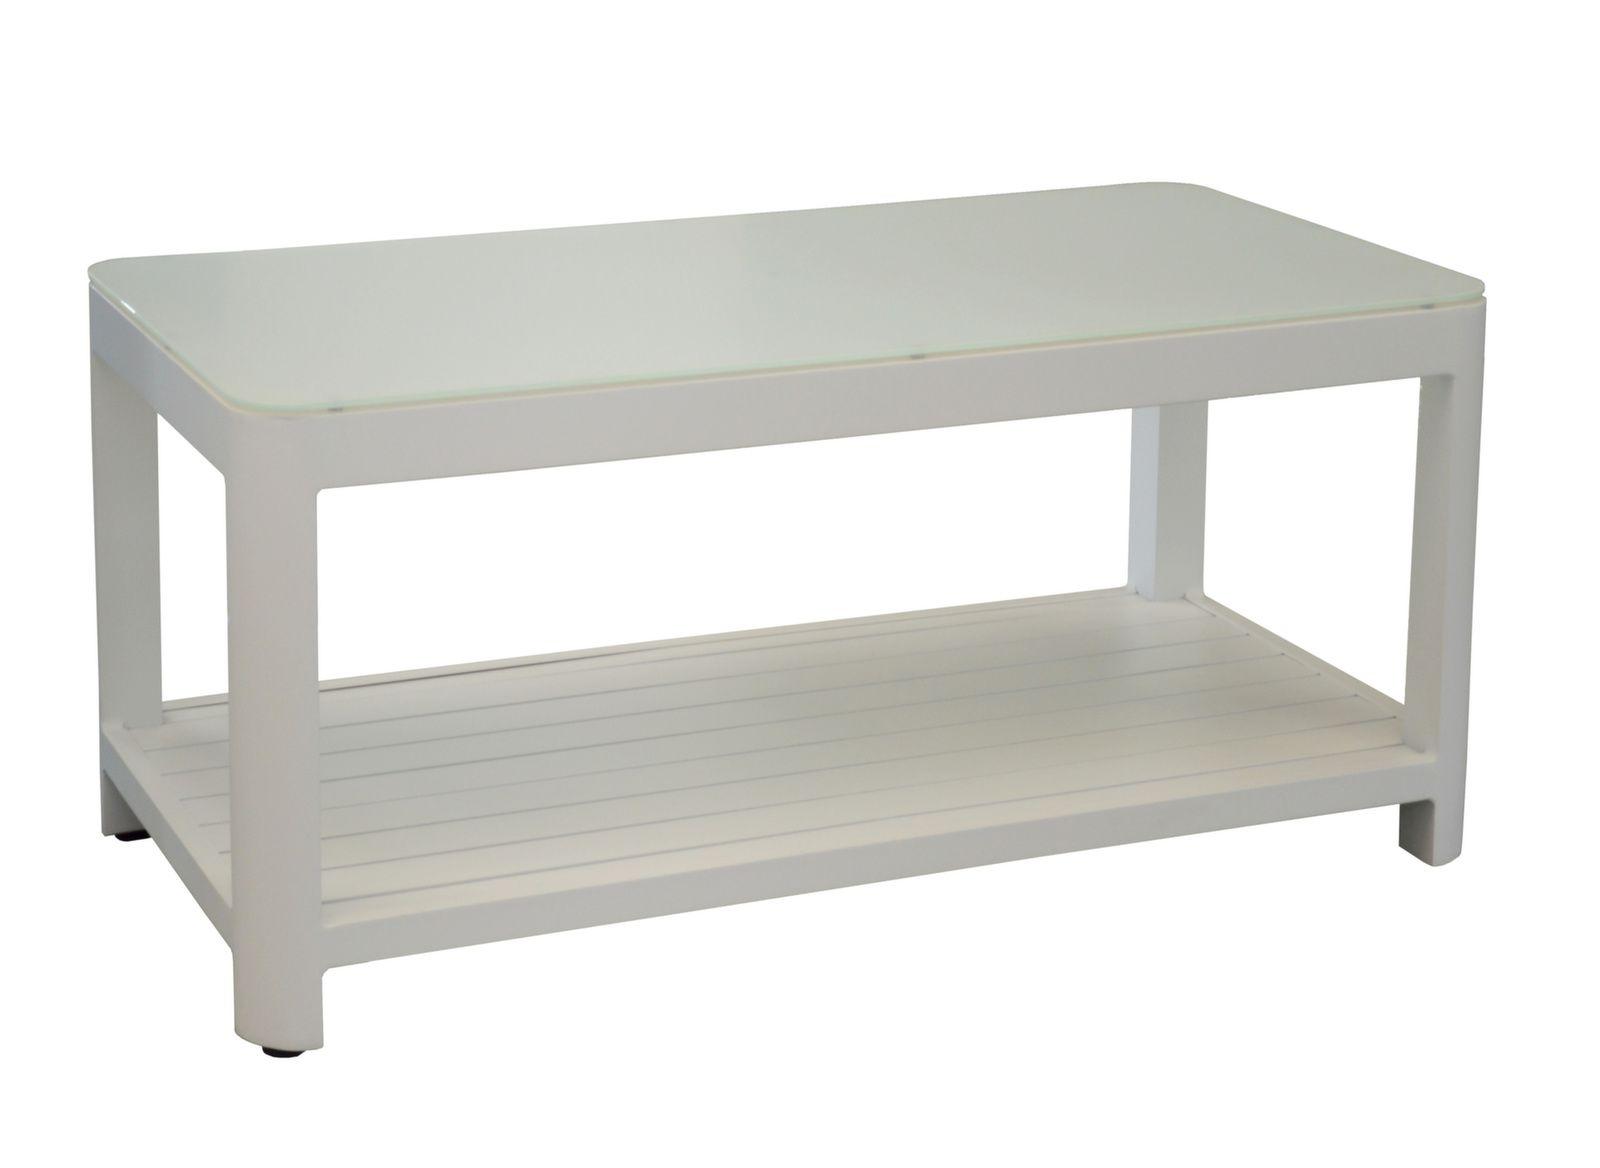 table basse z bra 120 x 60 cm plateau verre tables. Black Bedroom Furniture Sets. Home Design Ideas